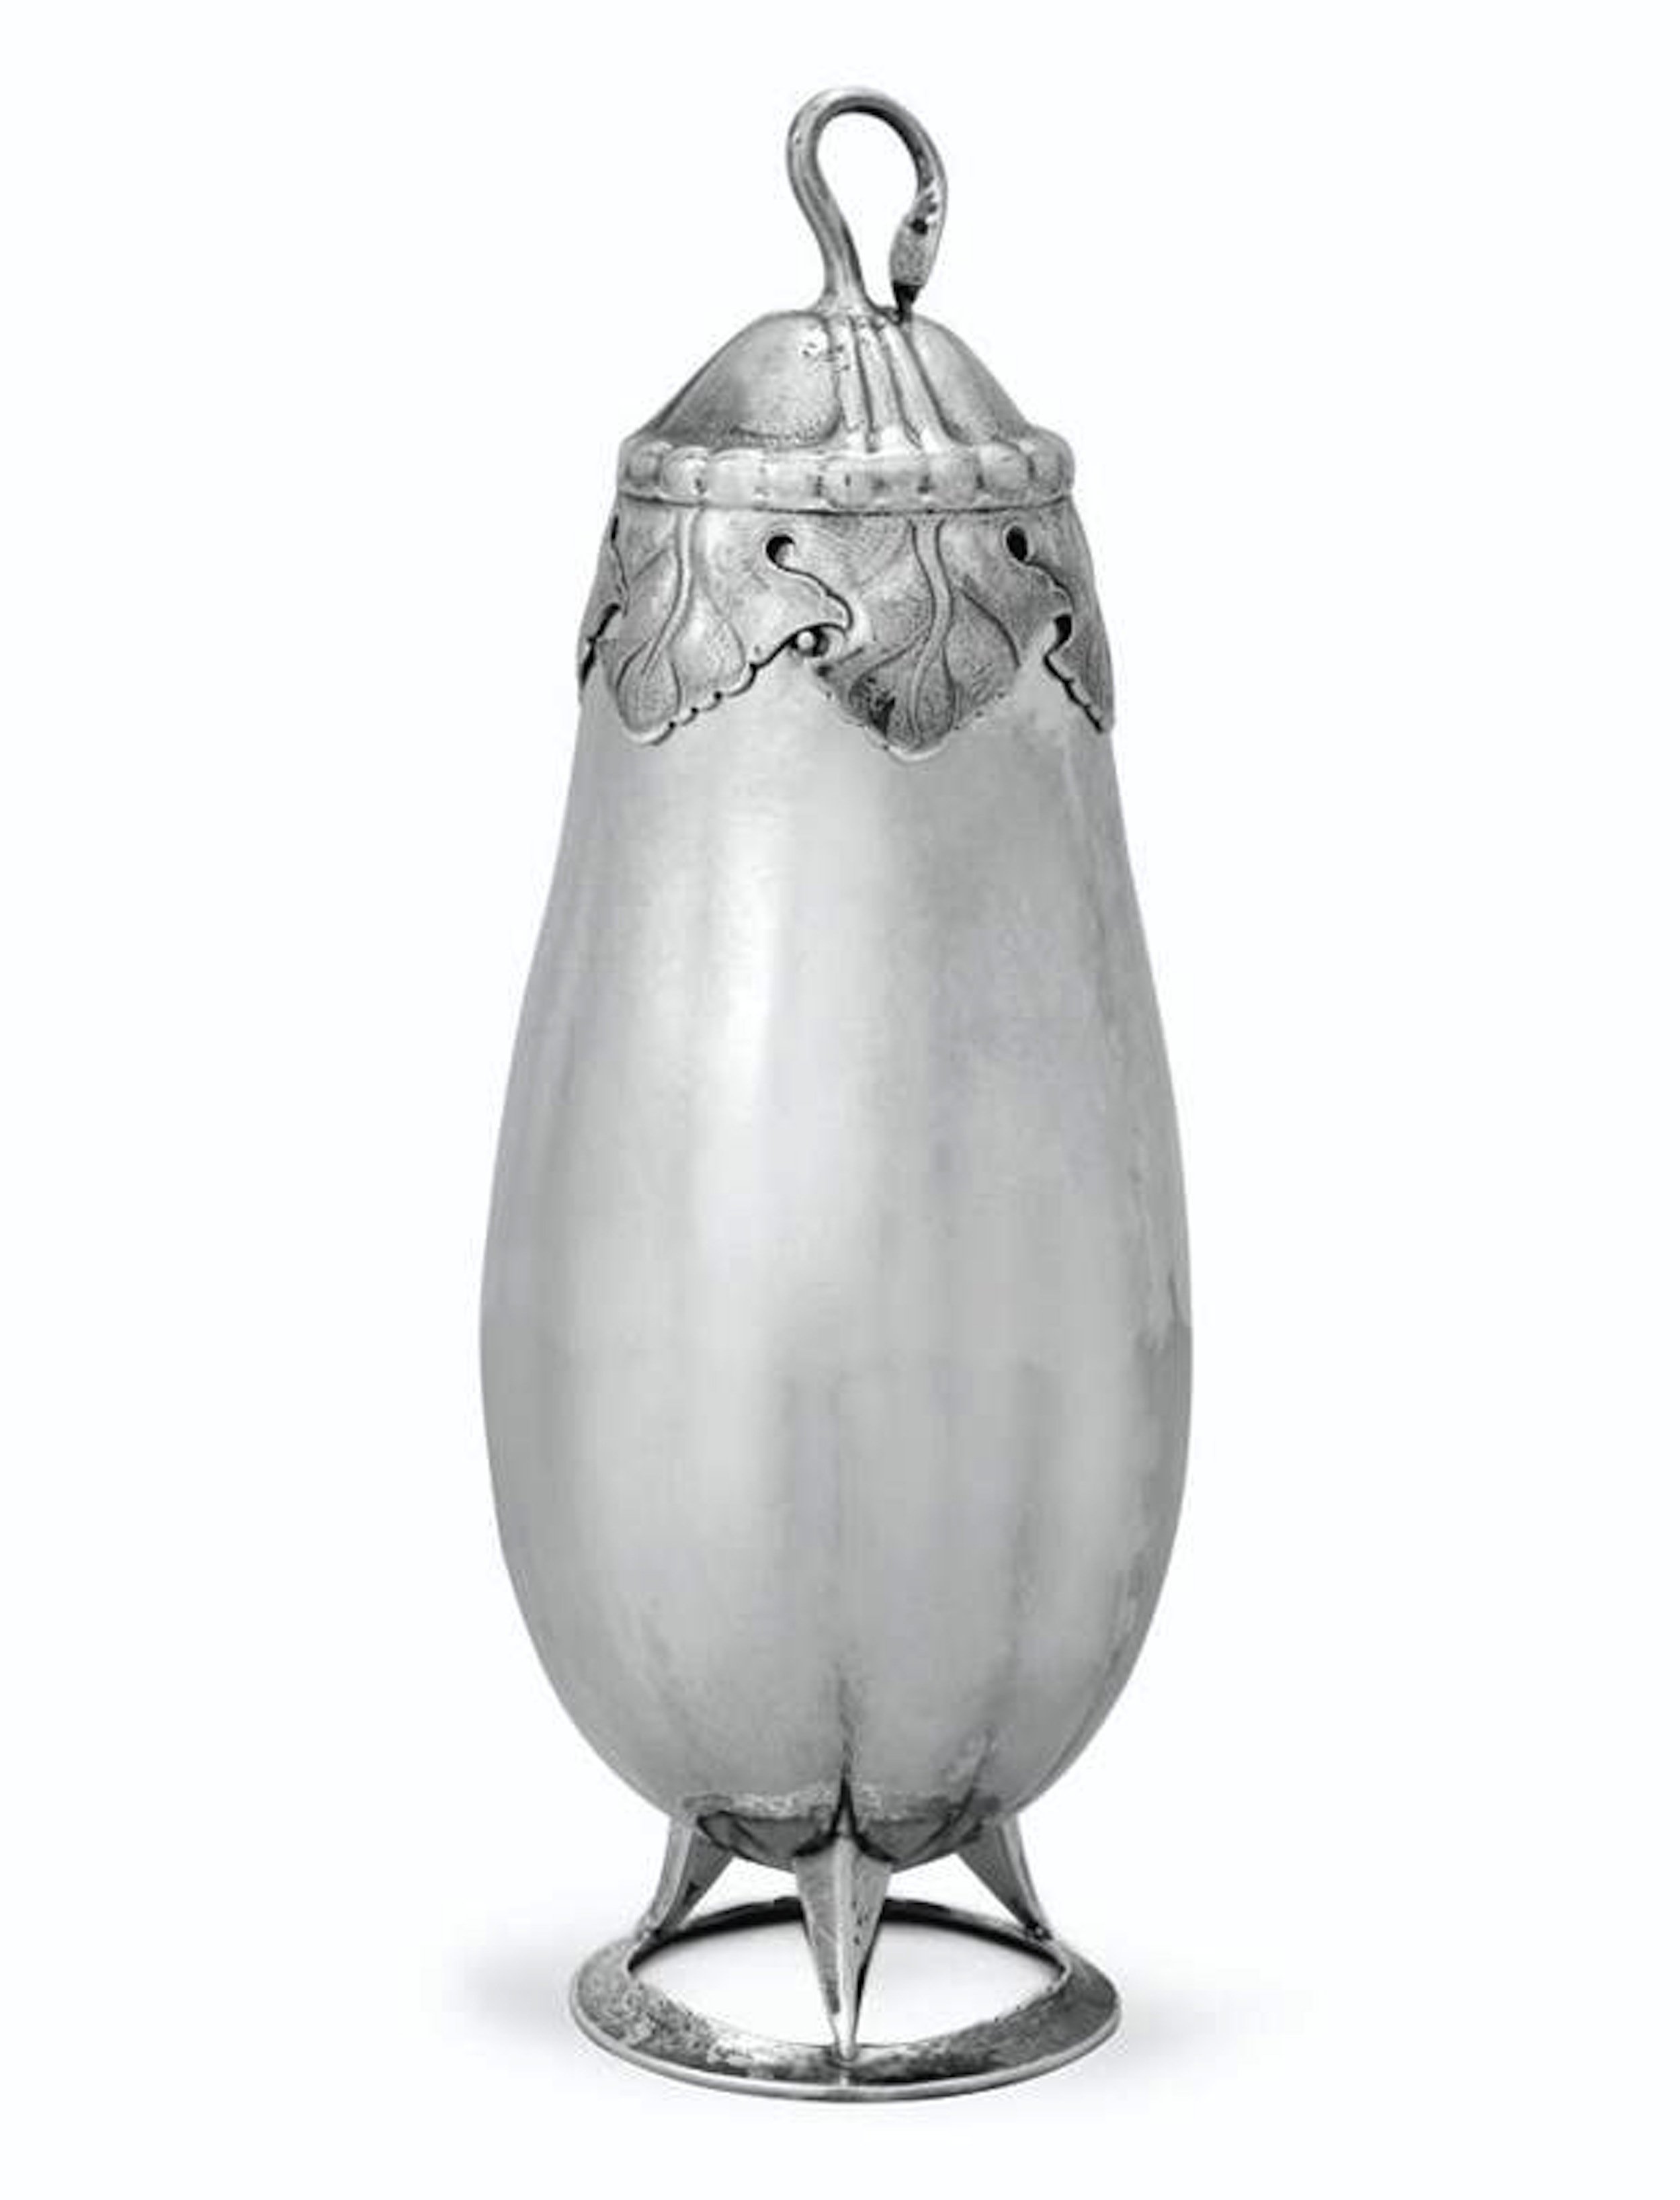 Peer Smed, Brooklyn New York. Cocktail shaker, 1934.